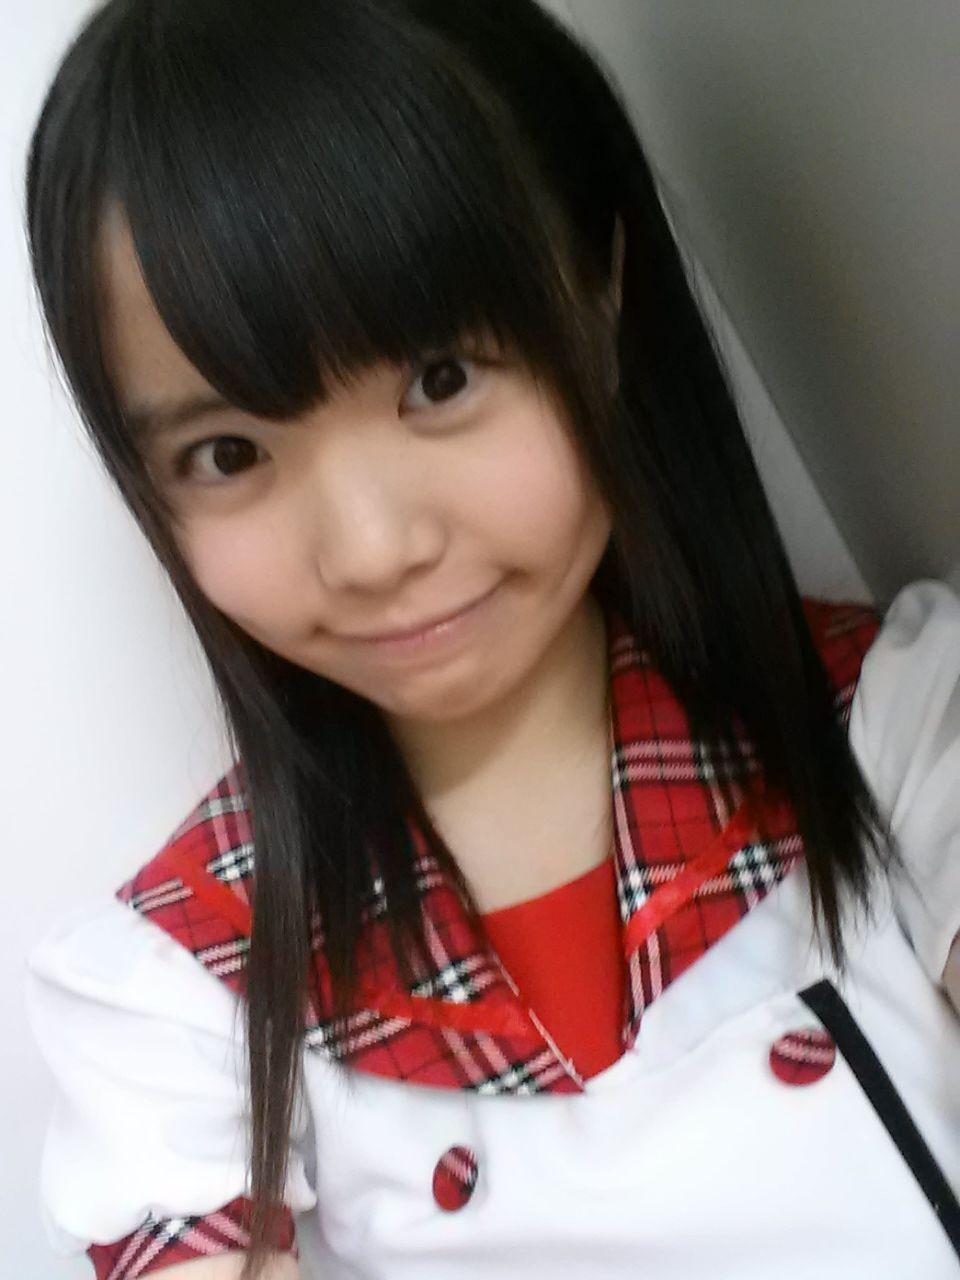 http://livedoor.blogimg.jp/otohaeika/imgs/c/f/cfb4c255.jpg